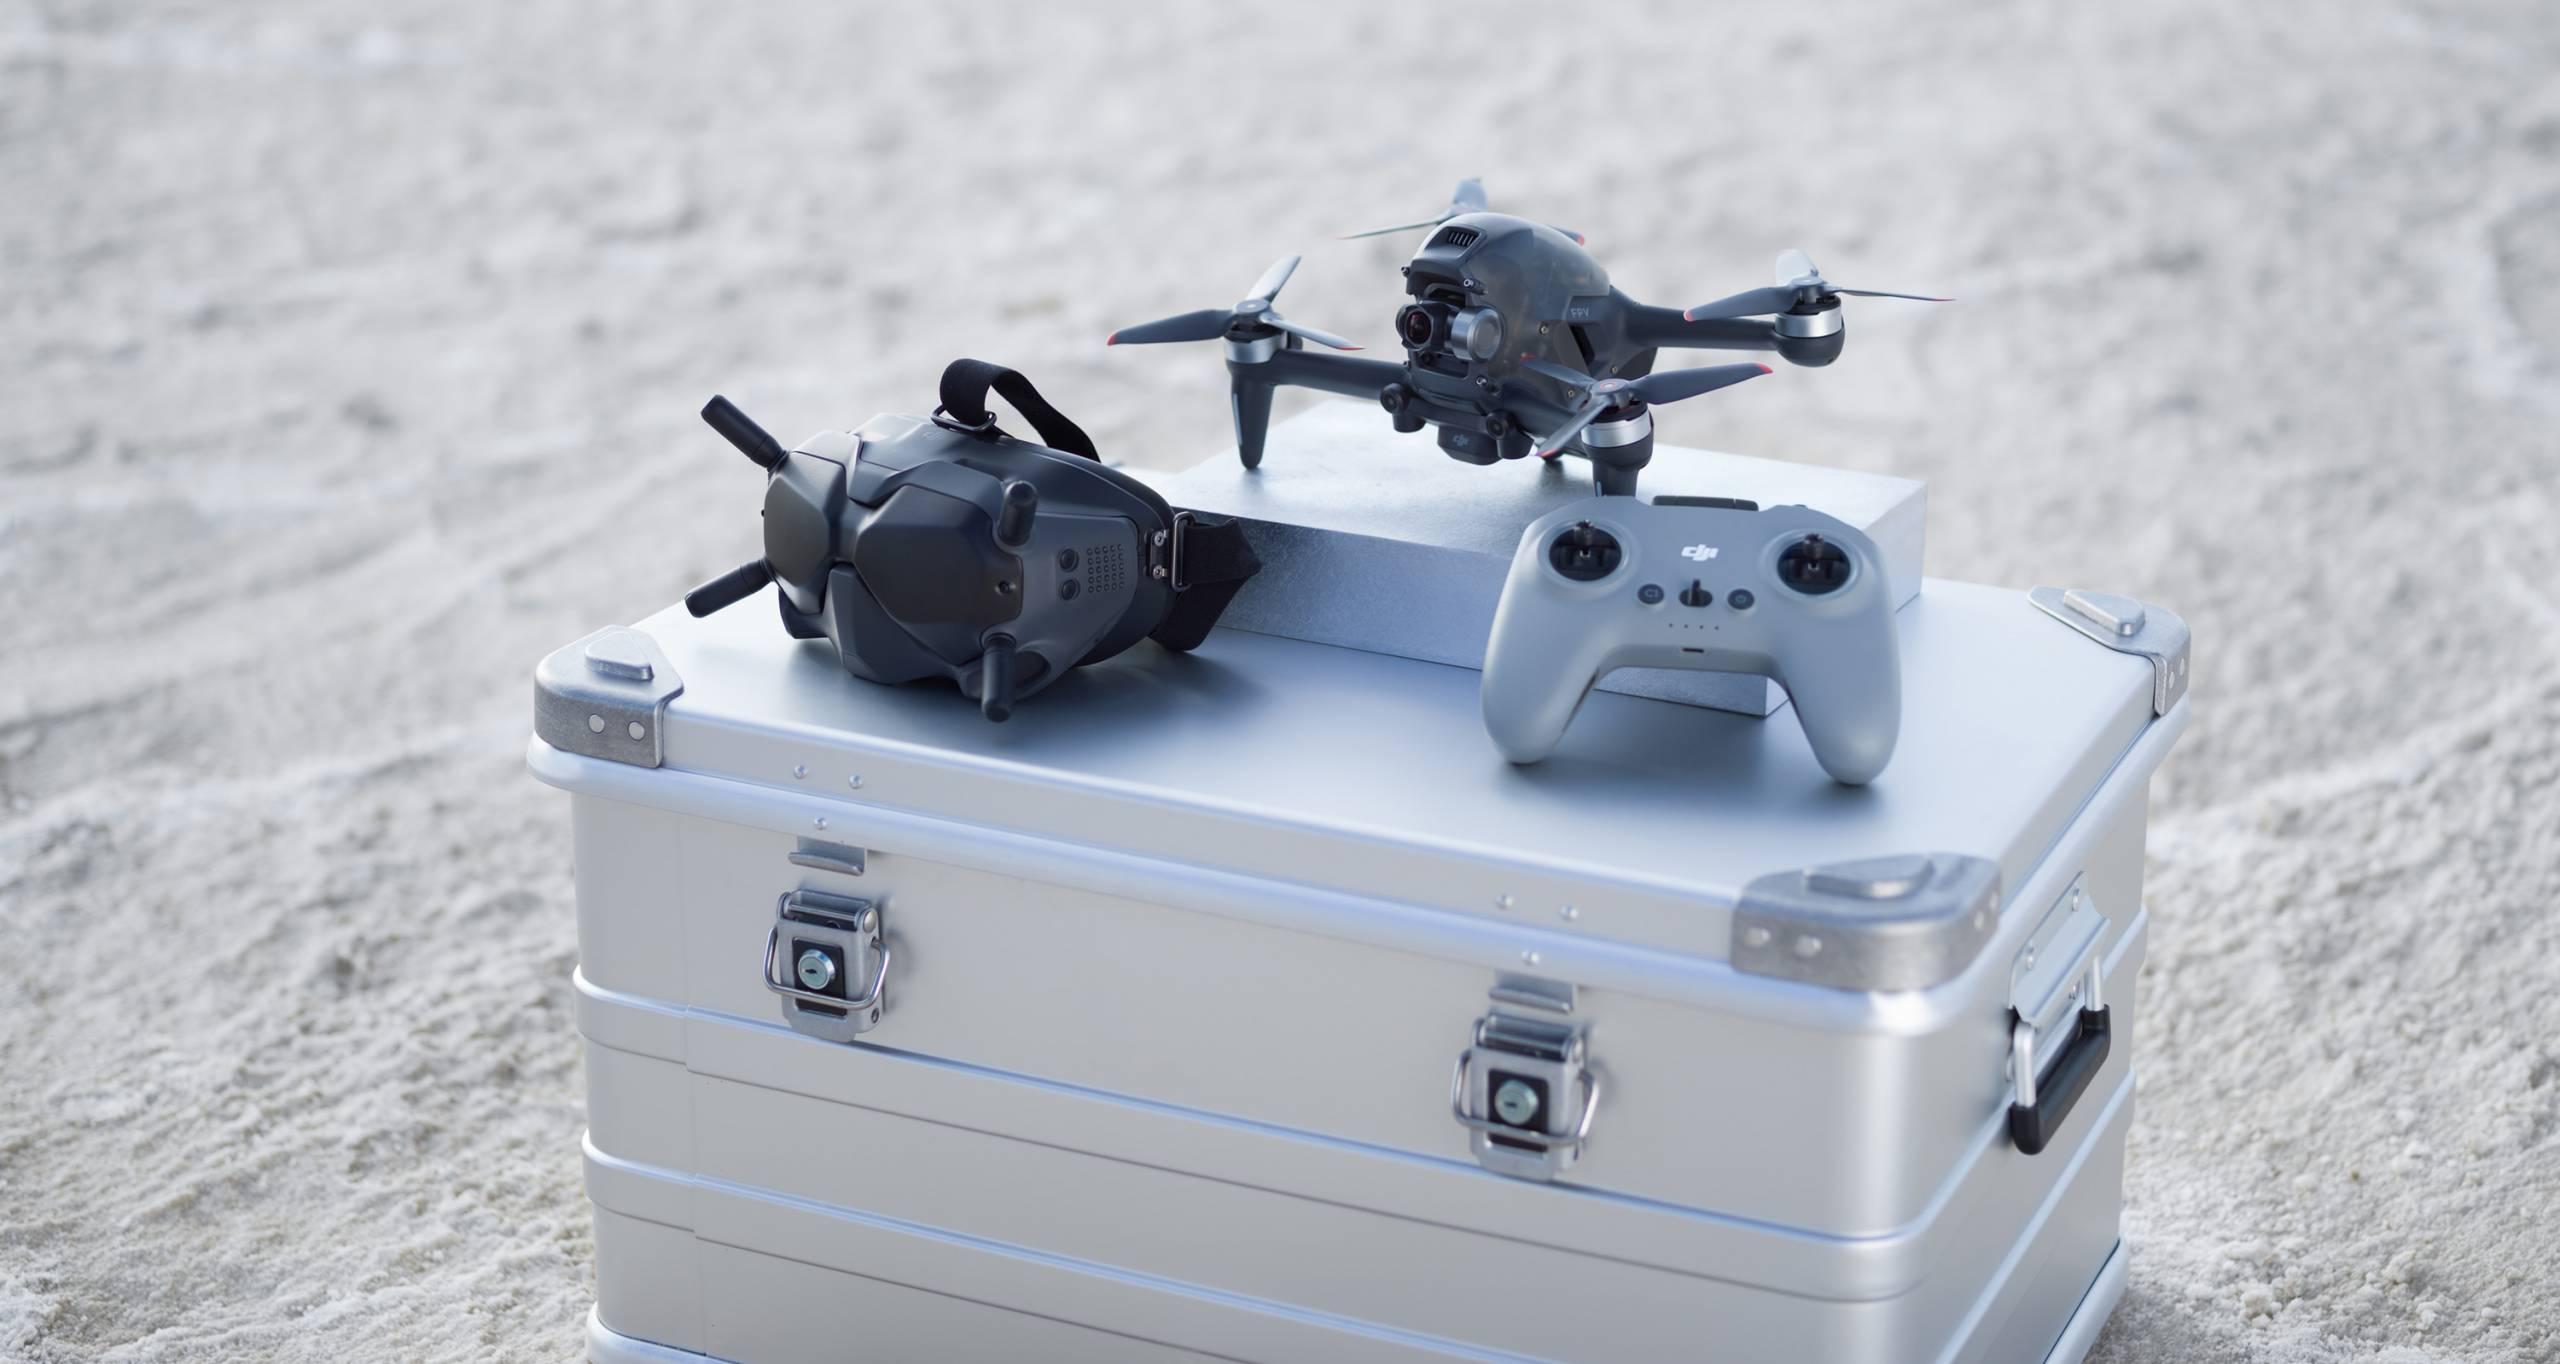 DJI FPV Drone and controller resting on metal gear box